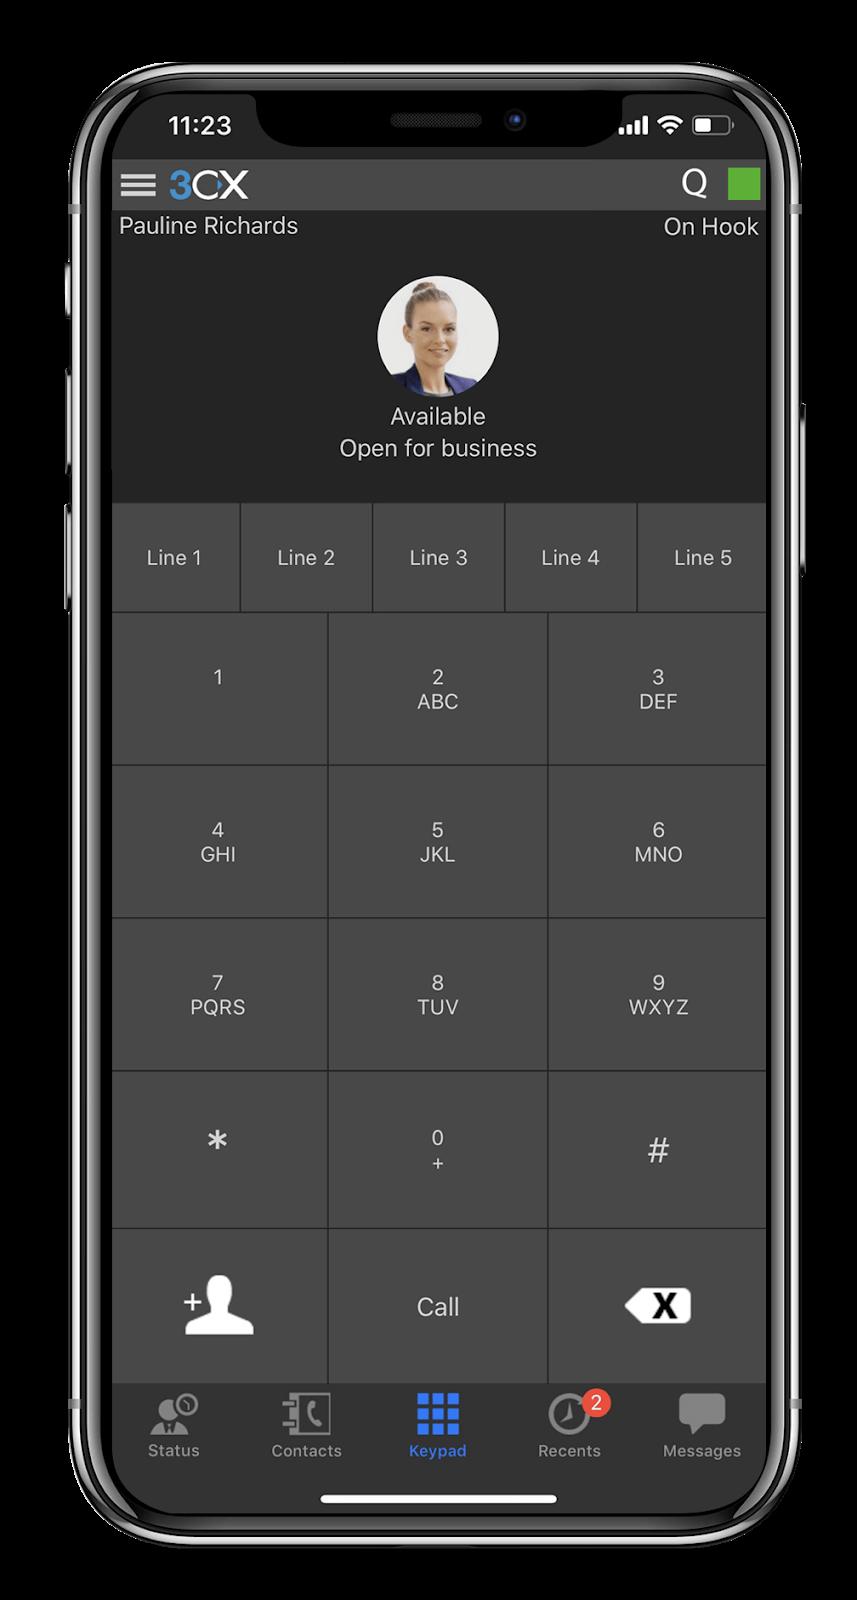 3CX phone system: iPhone app